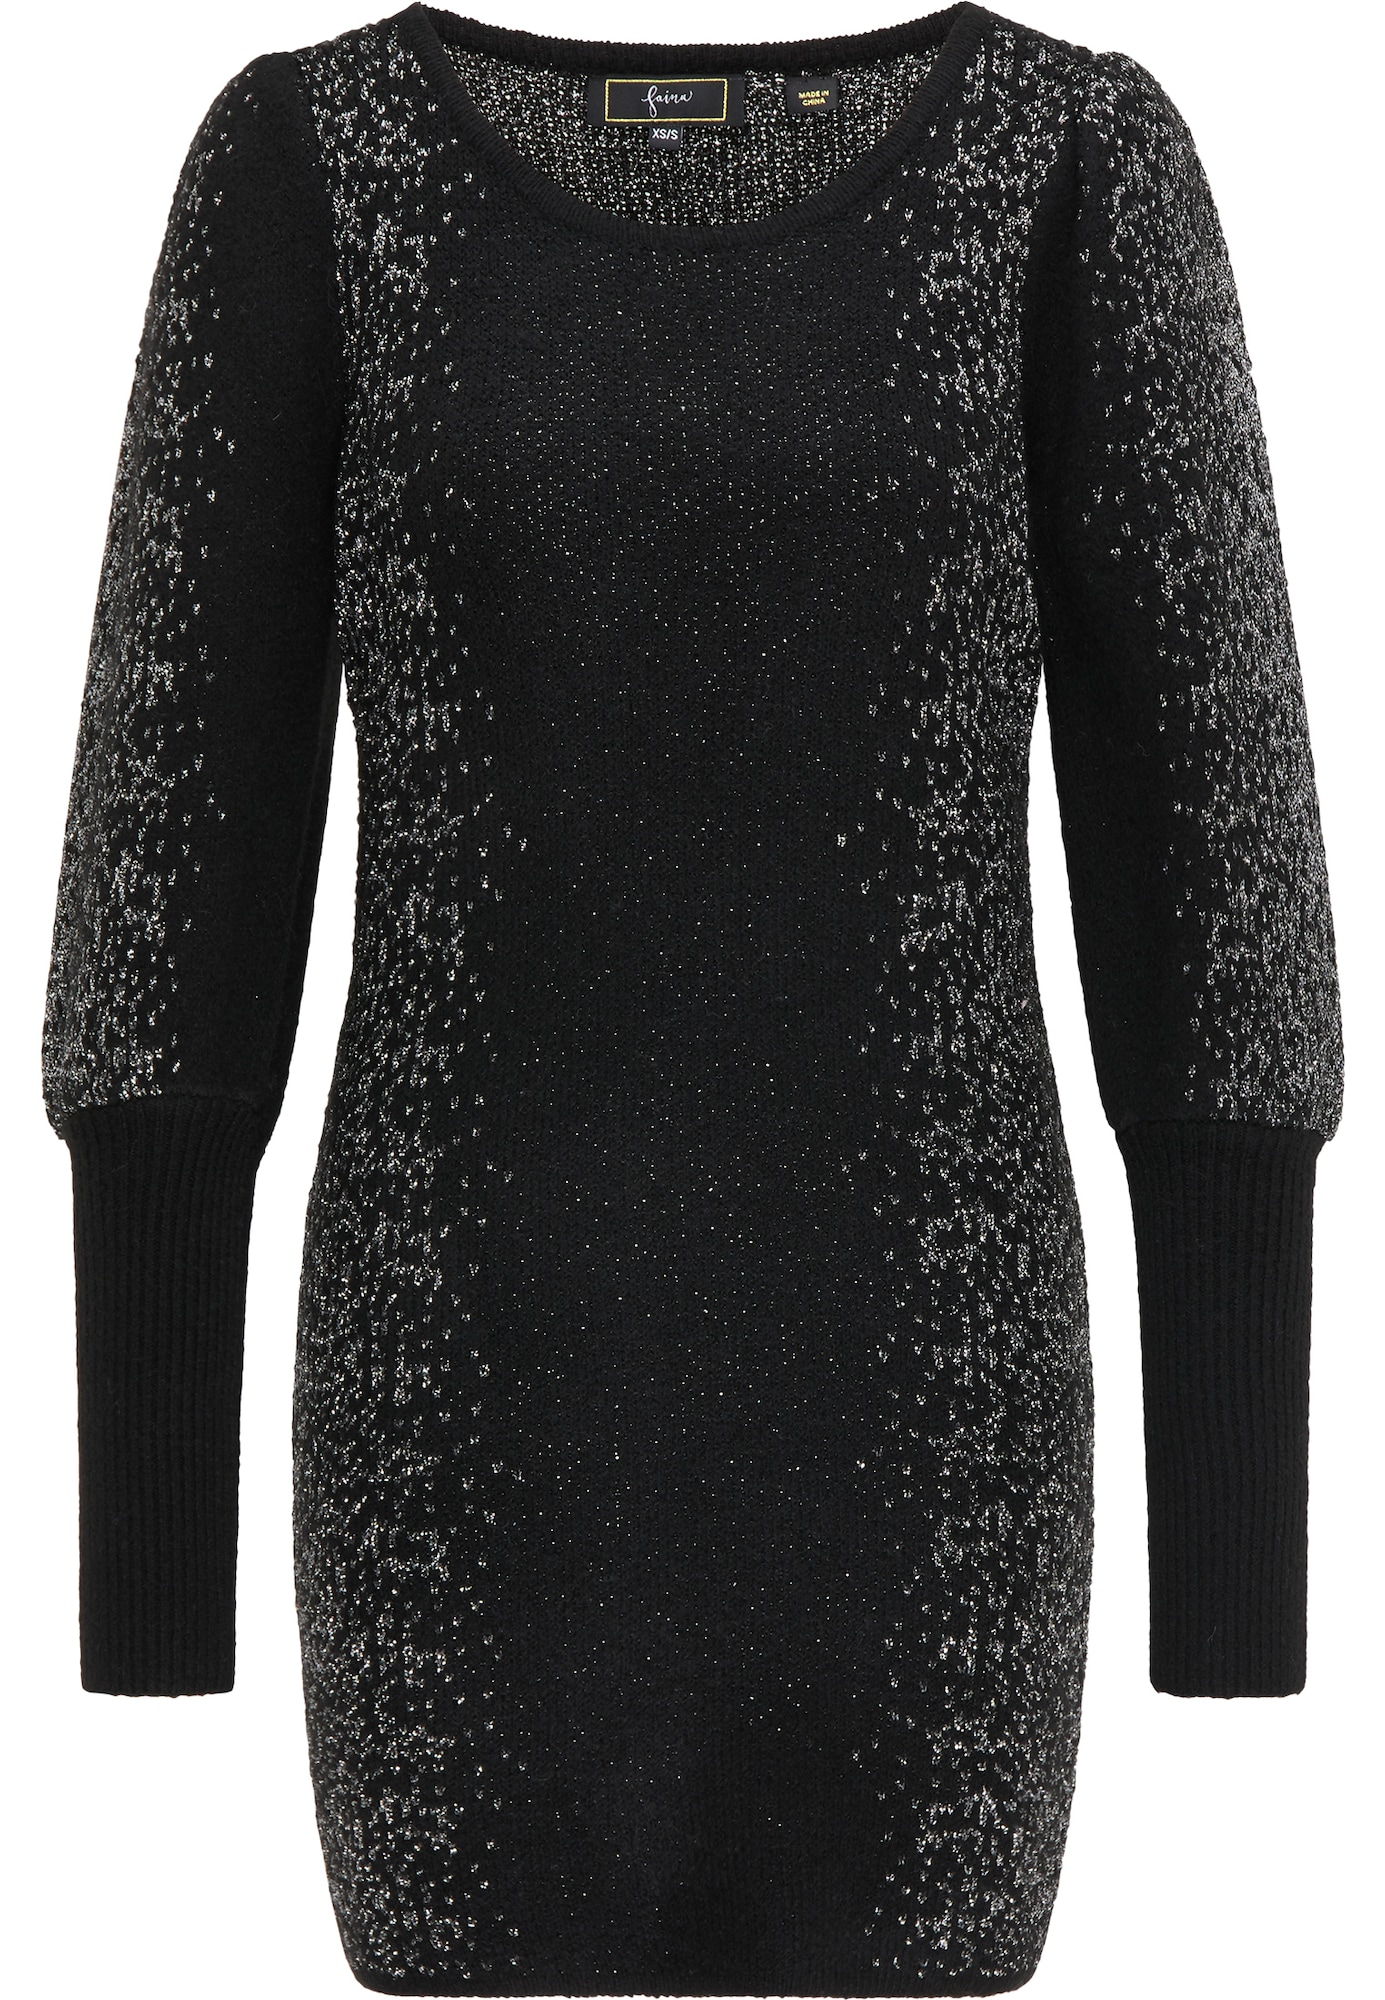 faina Megzta suknelė juoda